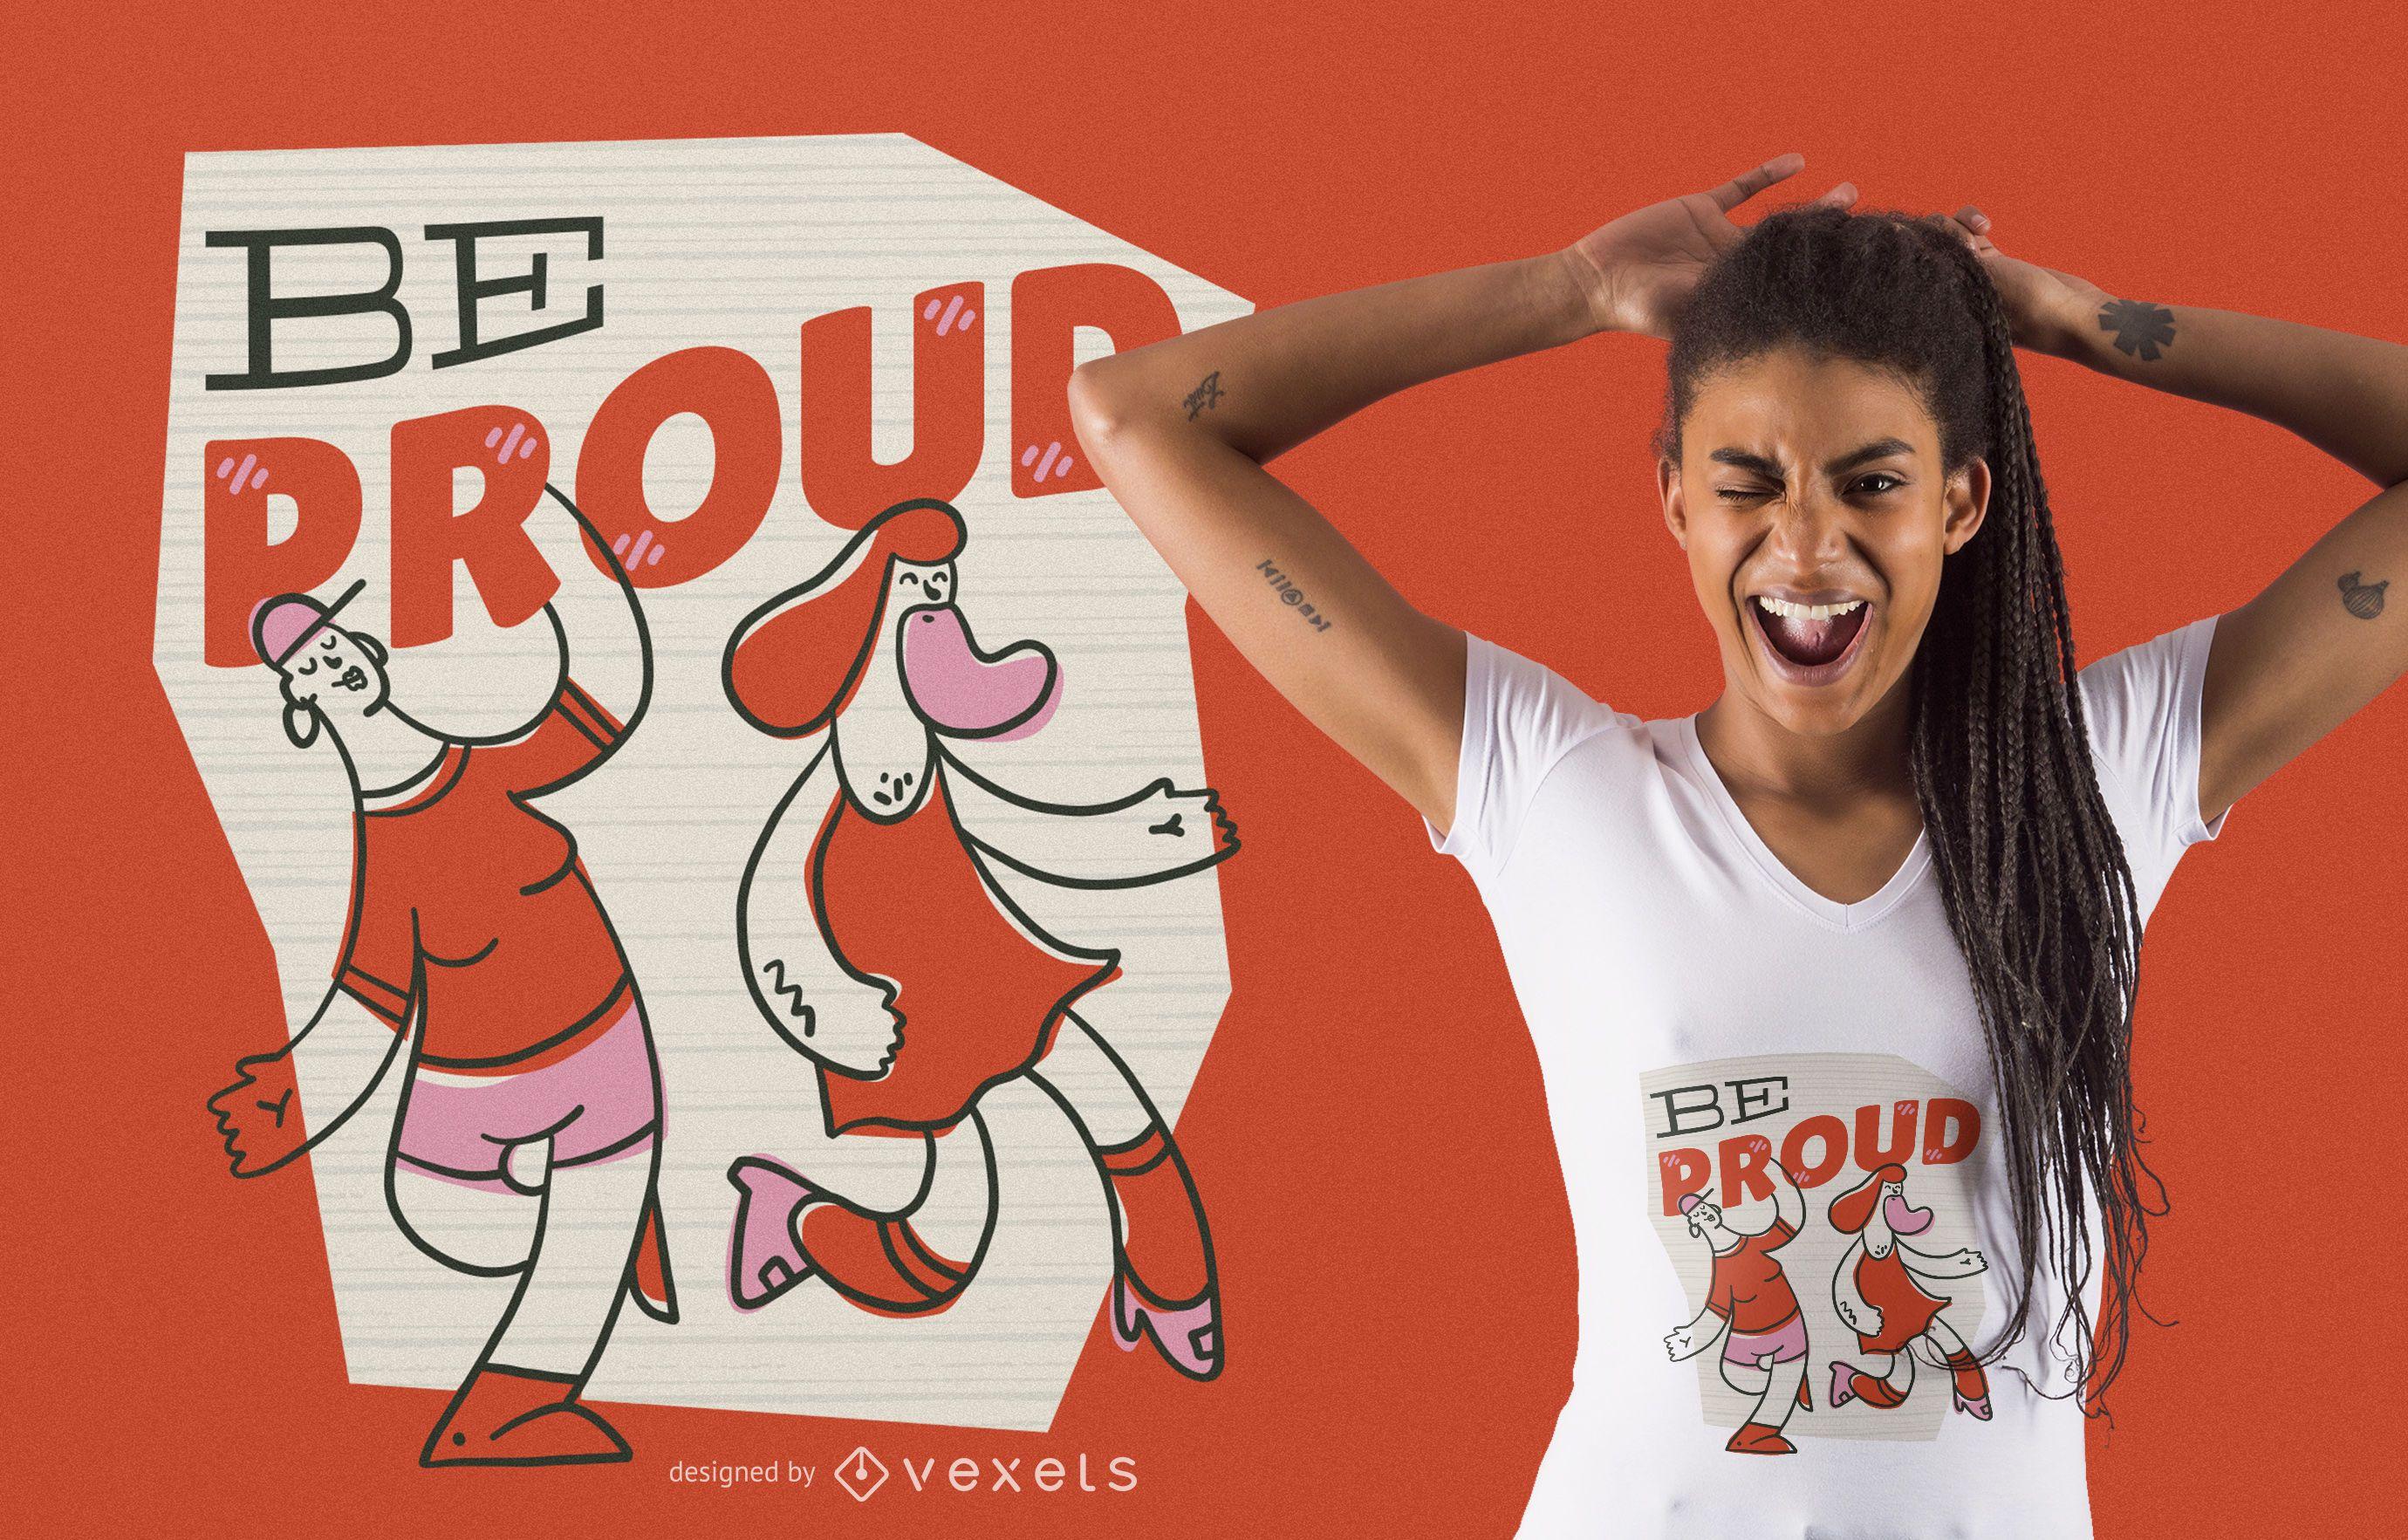 Be proud t-shirt design